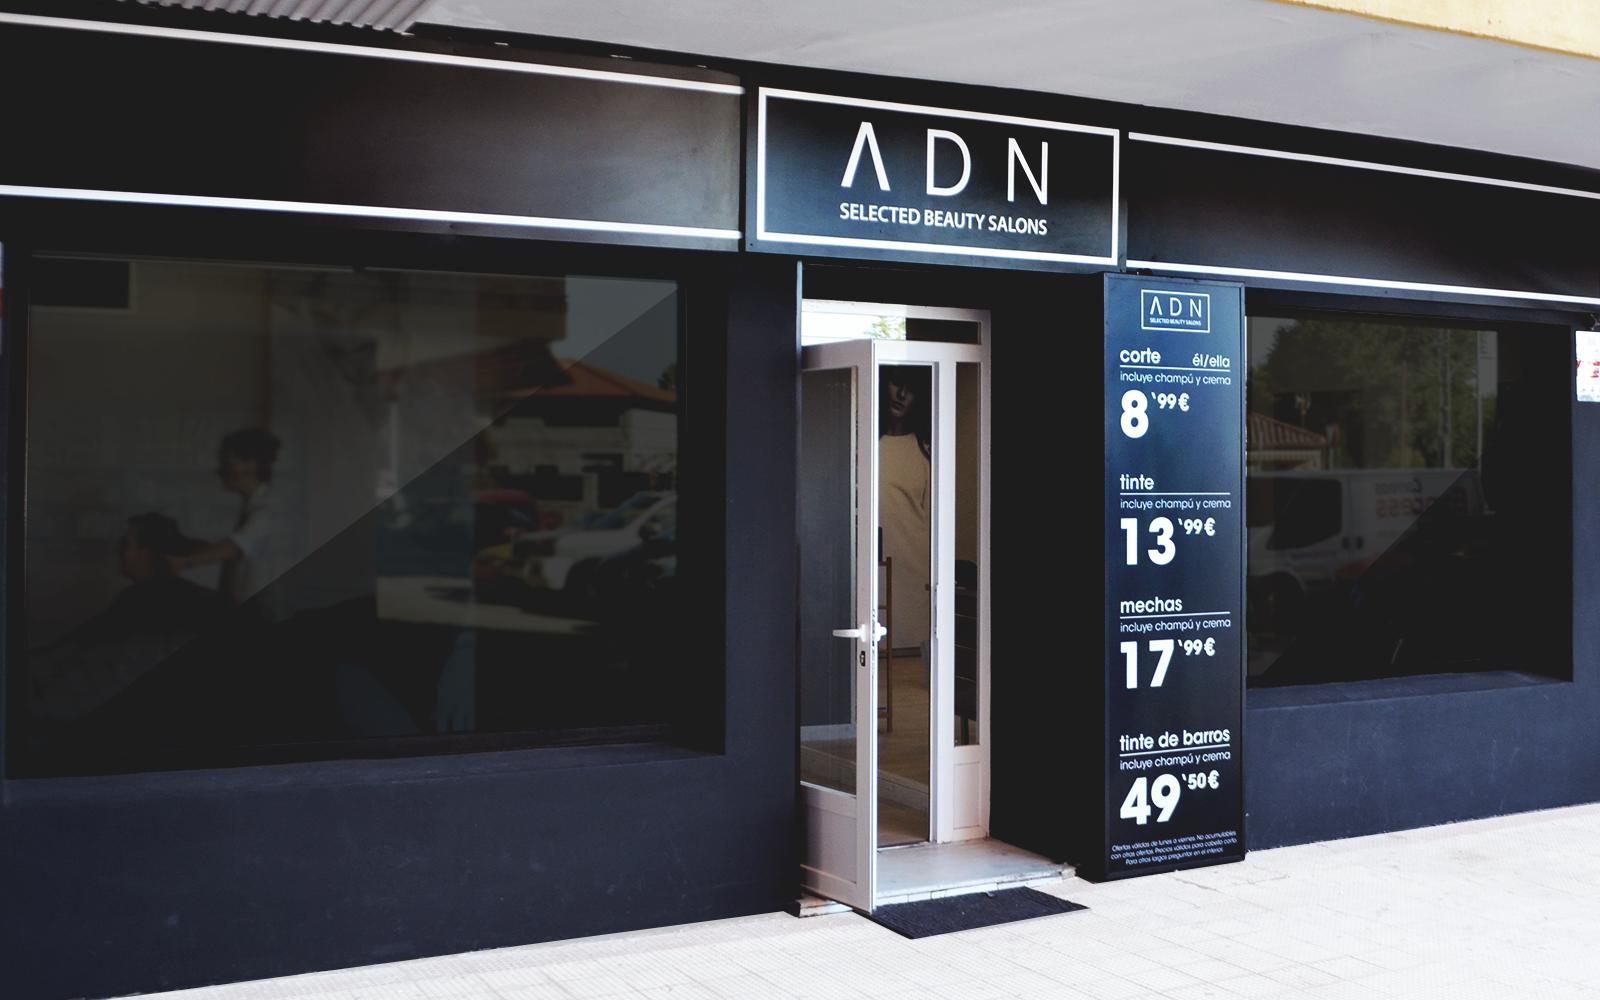 ADN Selected Beauty Salons 5